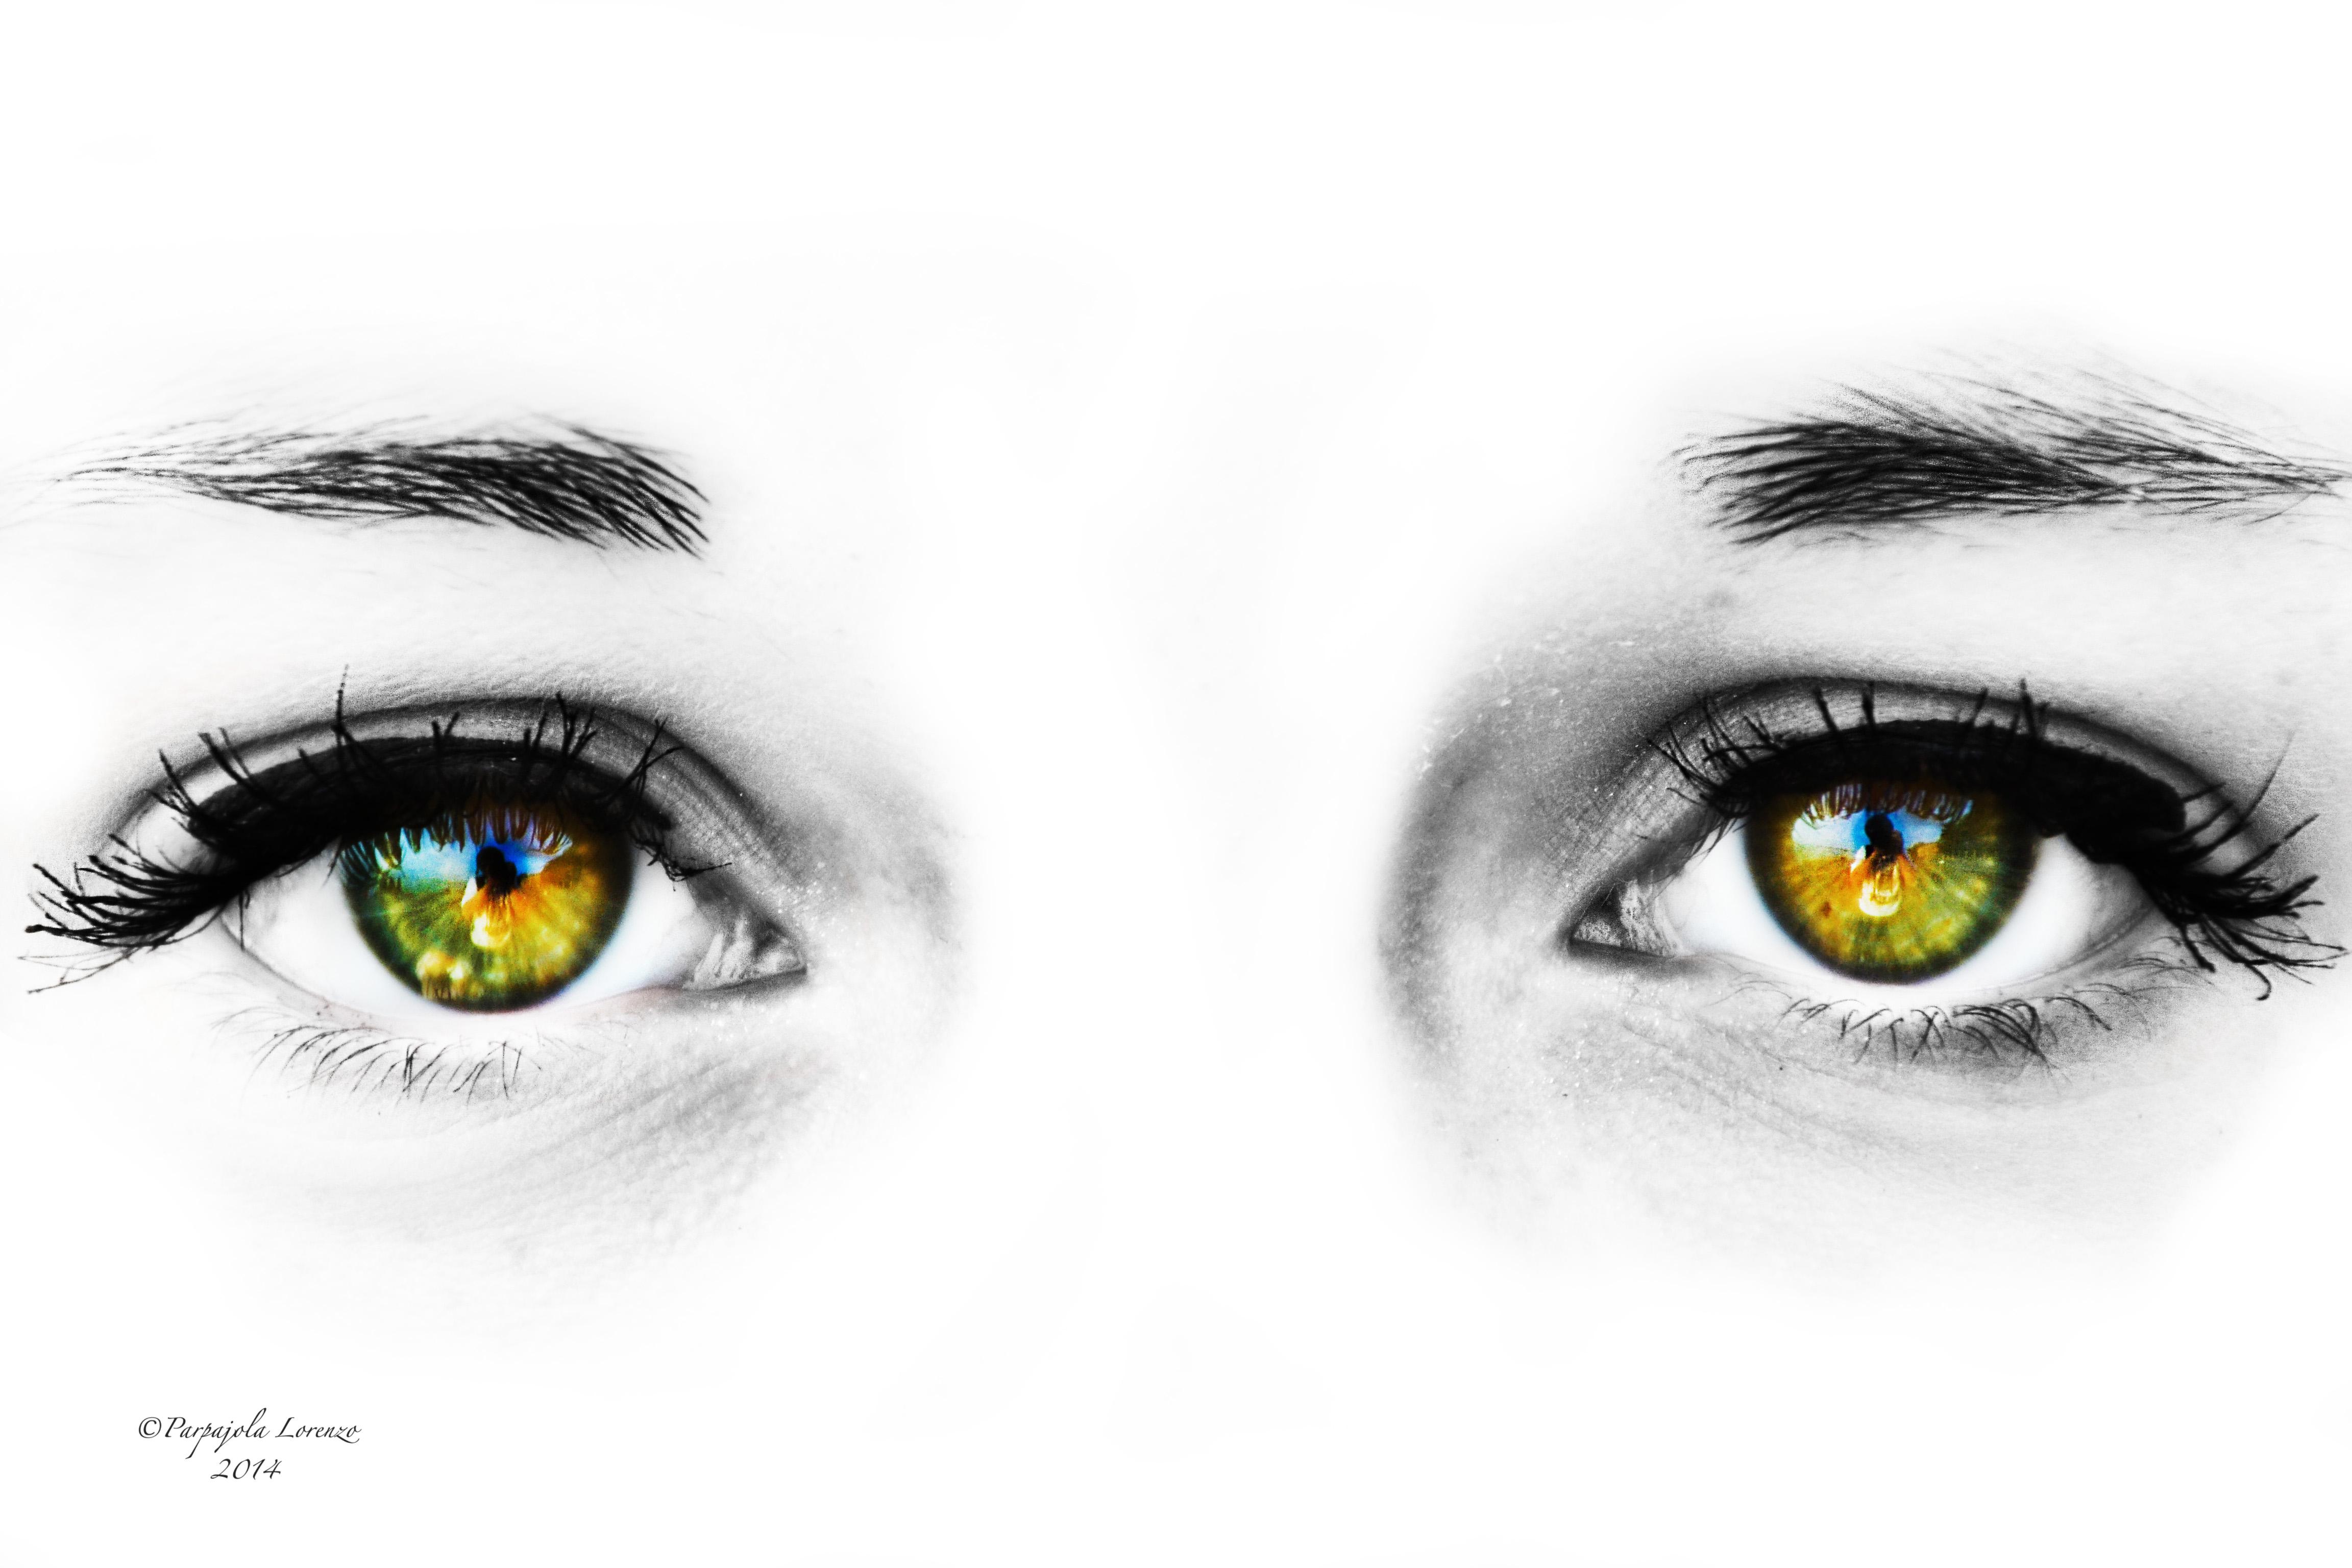 Wallpaper : face, lights, drawing, white, eyes, glasses